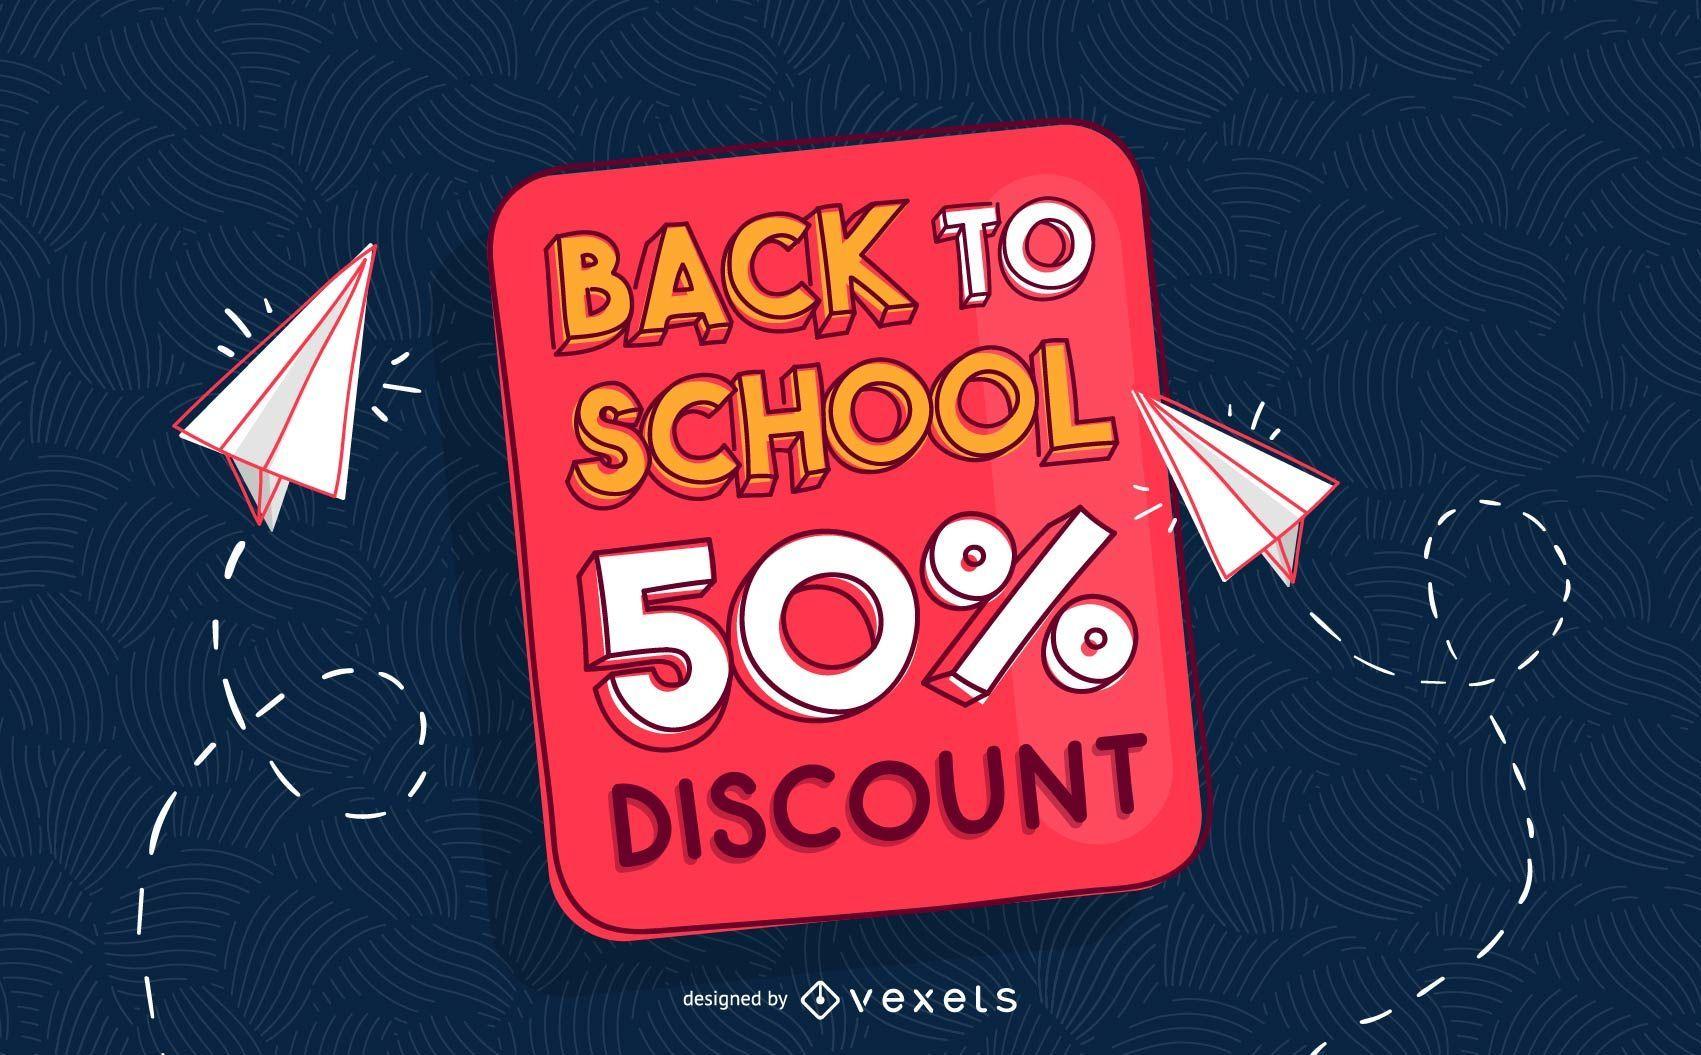 Back to school discount flyer